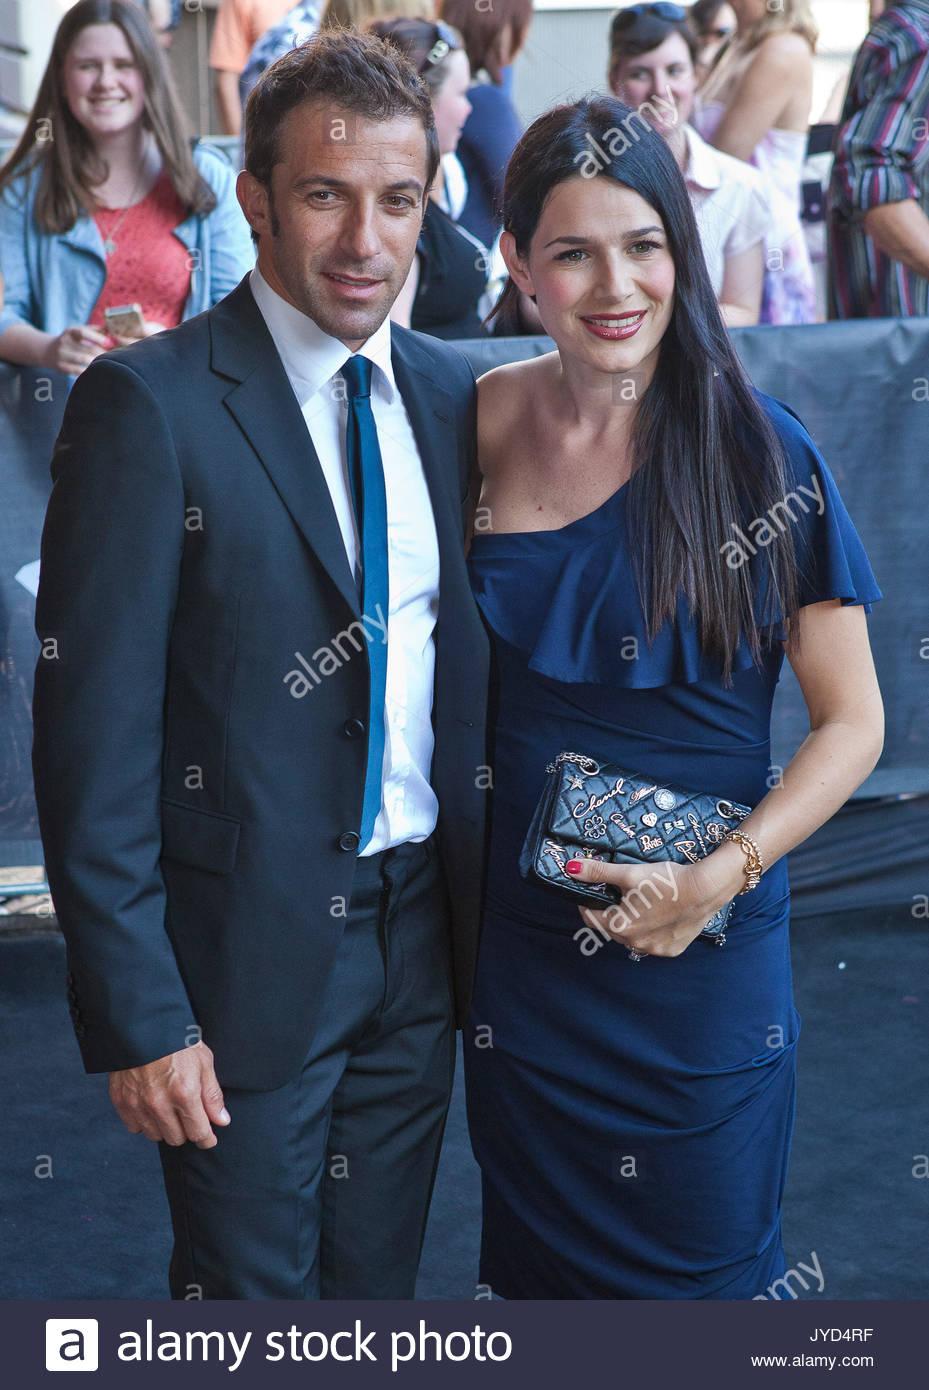 Alessandro Del Piero And Sonia Amoruso The Th Annual Aria Awards Held At The Sydney Entertainment Centre